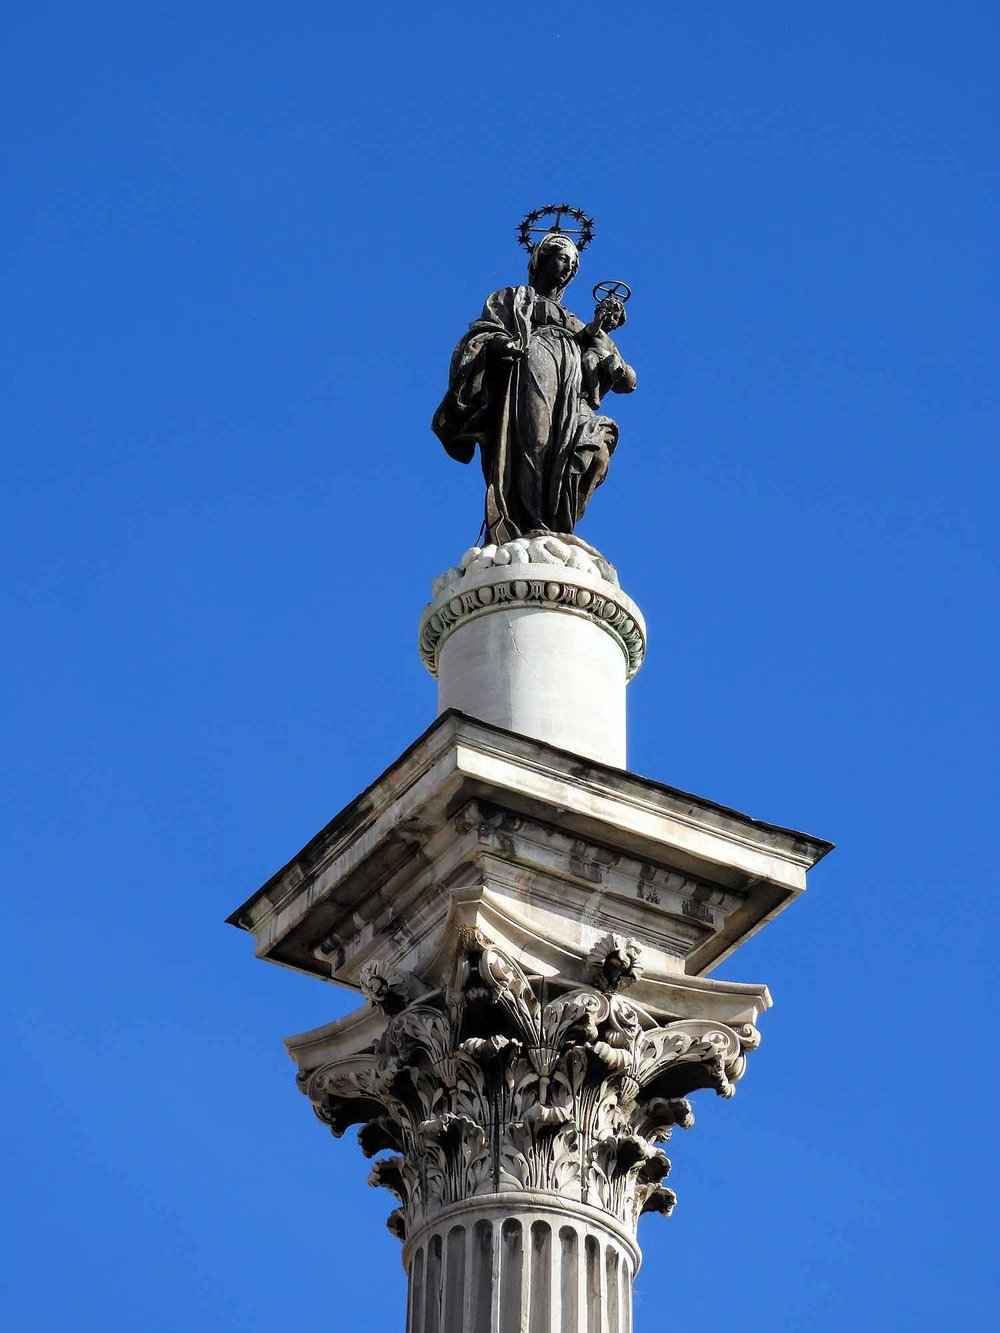 italy-italia-rome-column-statue.jpg